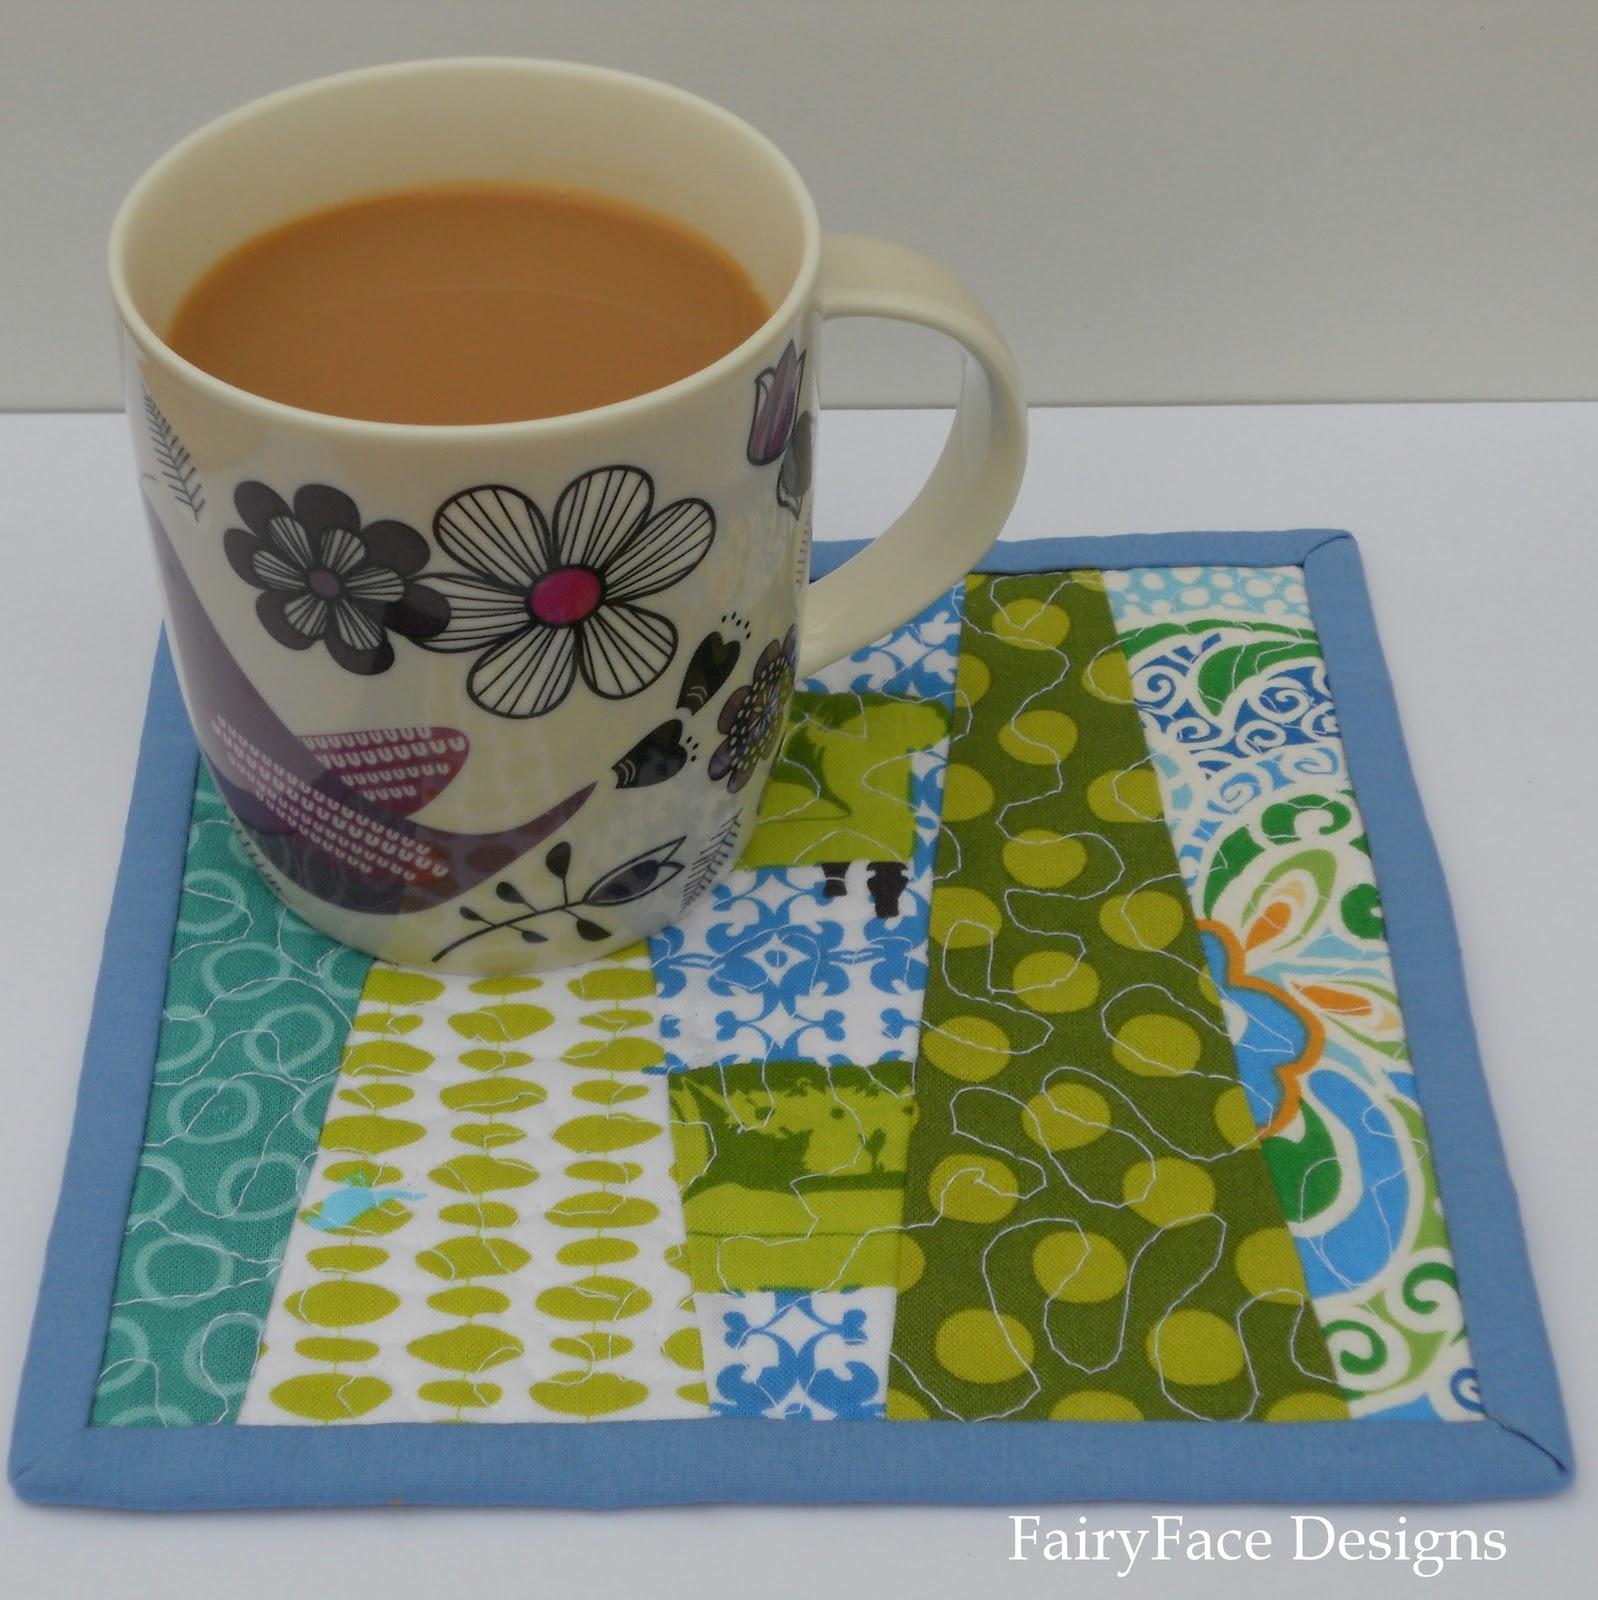 FairyFace Designs: Real Life And Mug Rugs